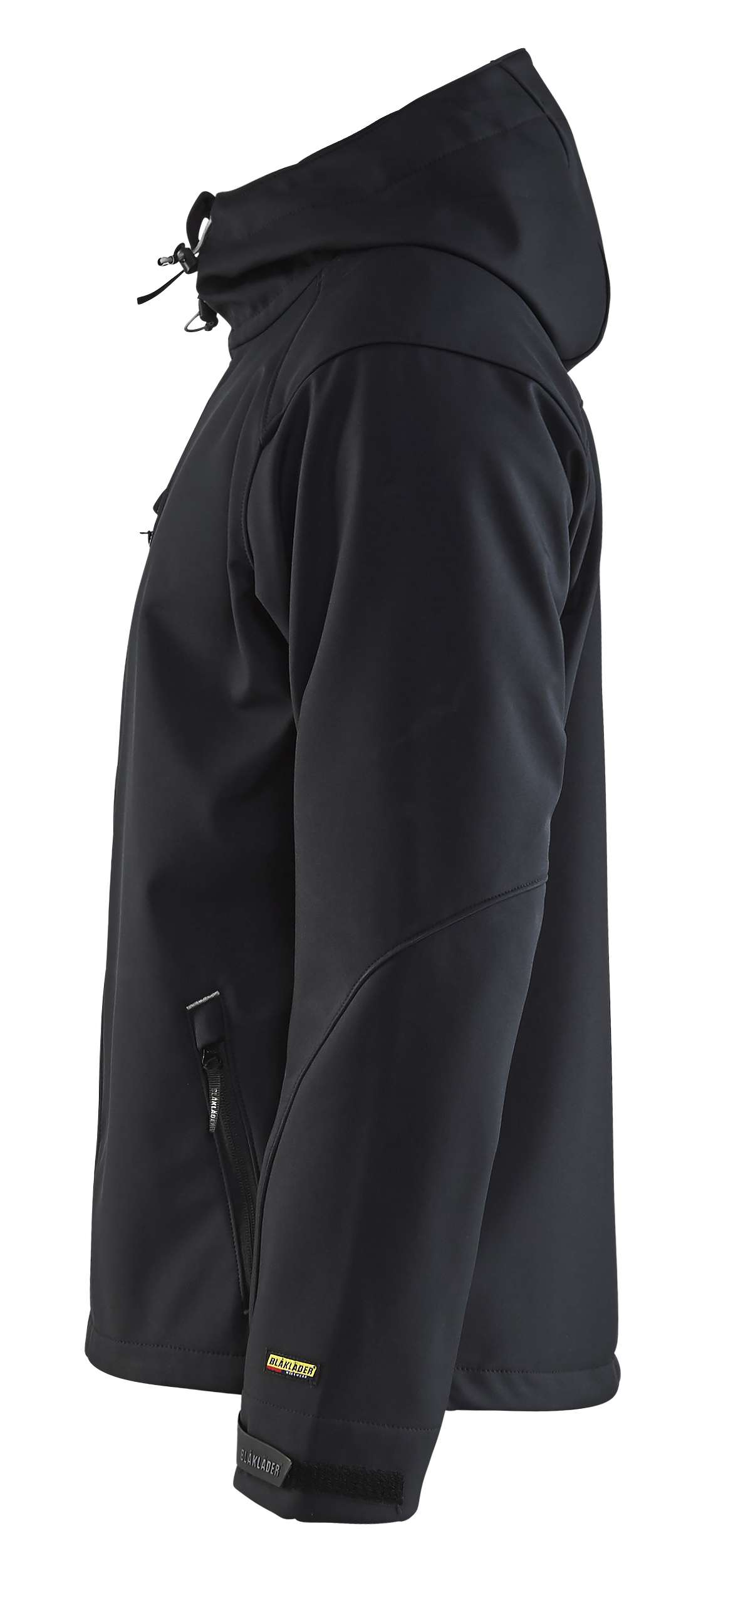 Blaklader Softshell jacks 49492517 zwart-zilver(9992)